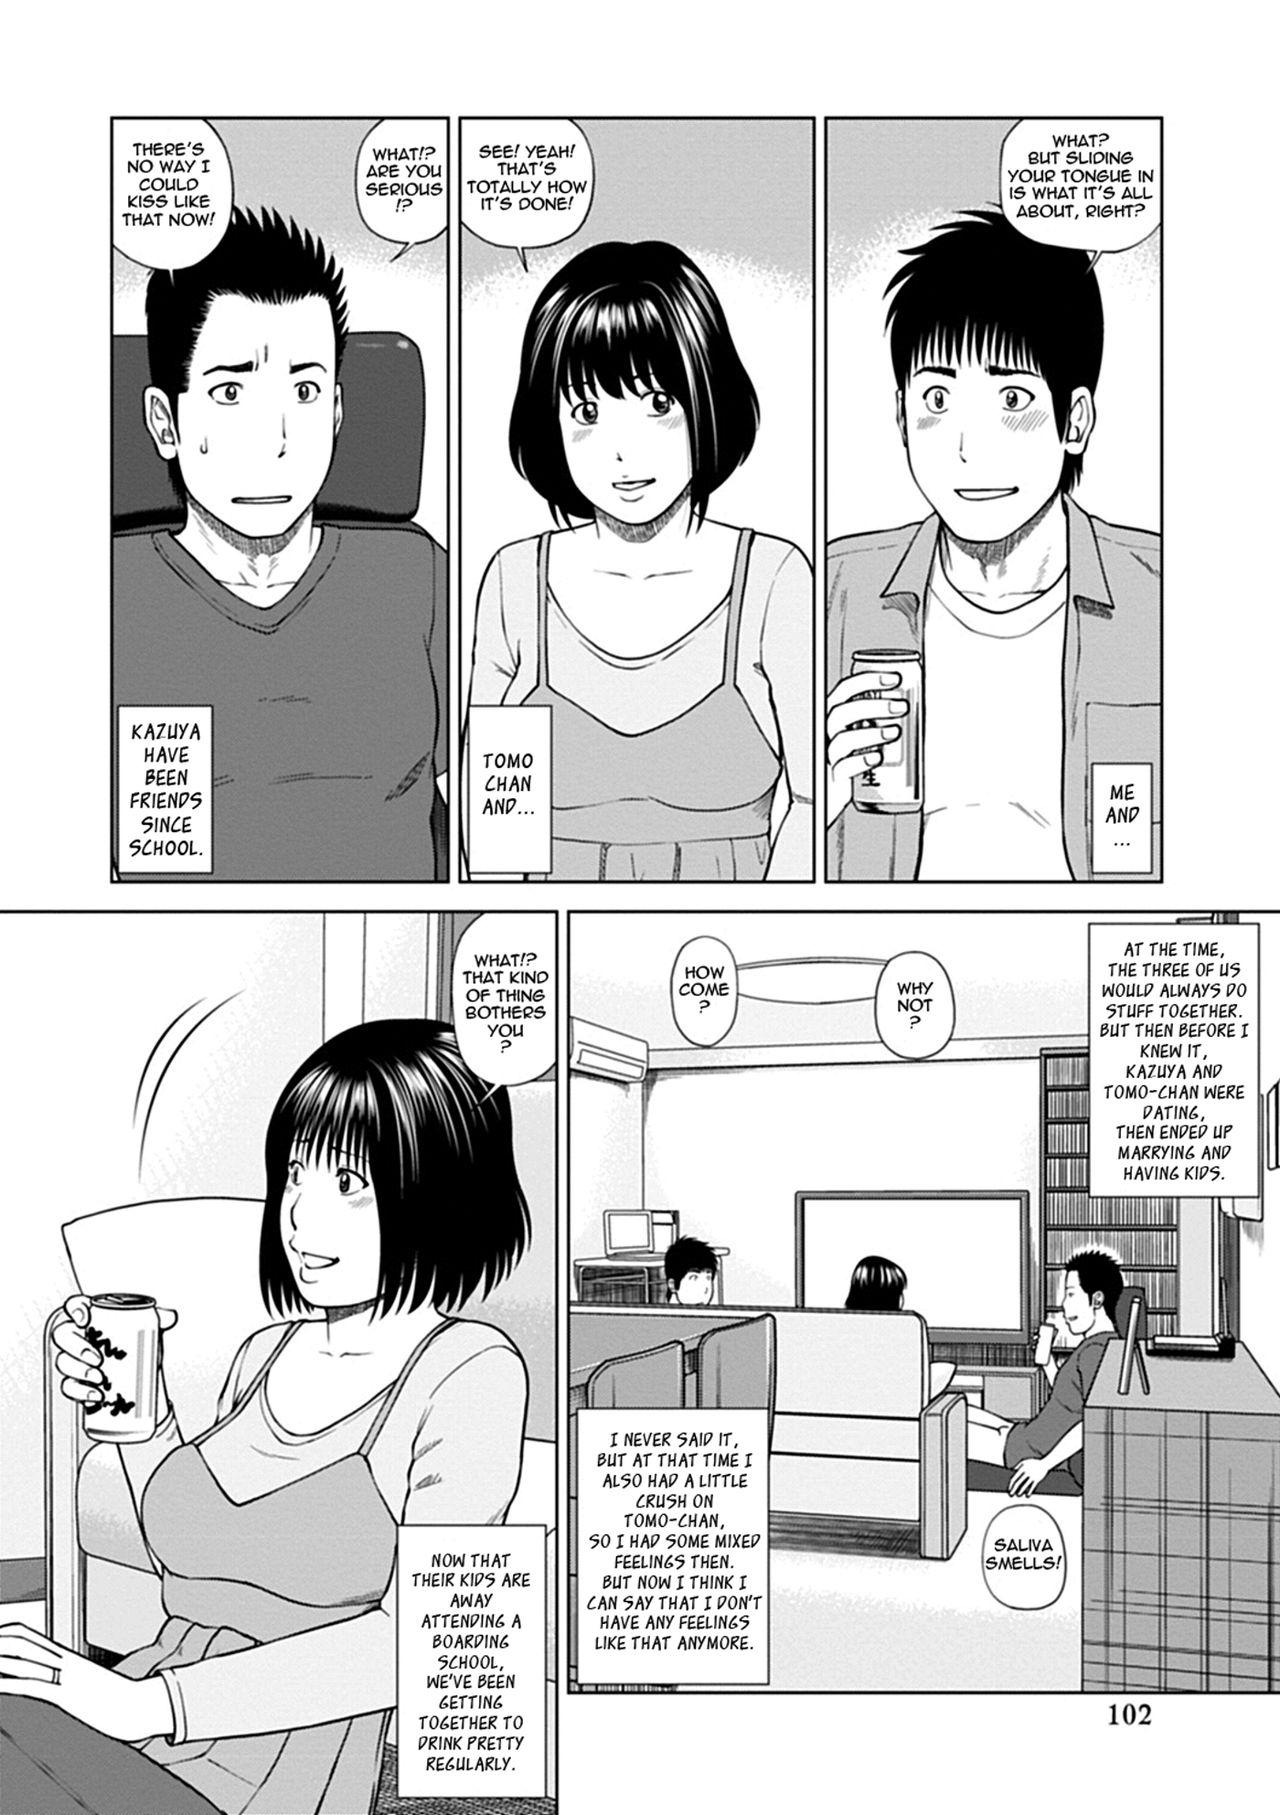 [Kuroki Hidehiko] 36-sai Injuku Sakarizuma | 36-Year-Old Randy Mature Wife [English] {Tadanohito} [Digital] [Uncensored] 97